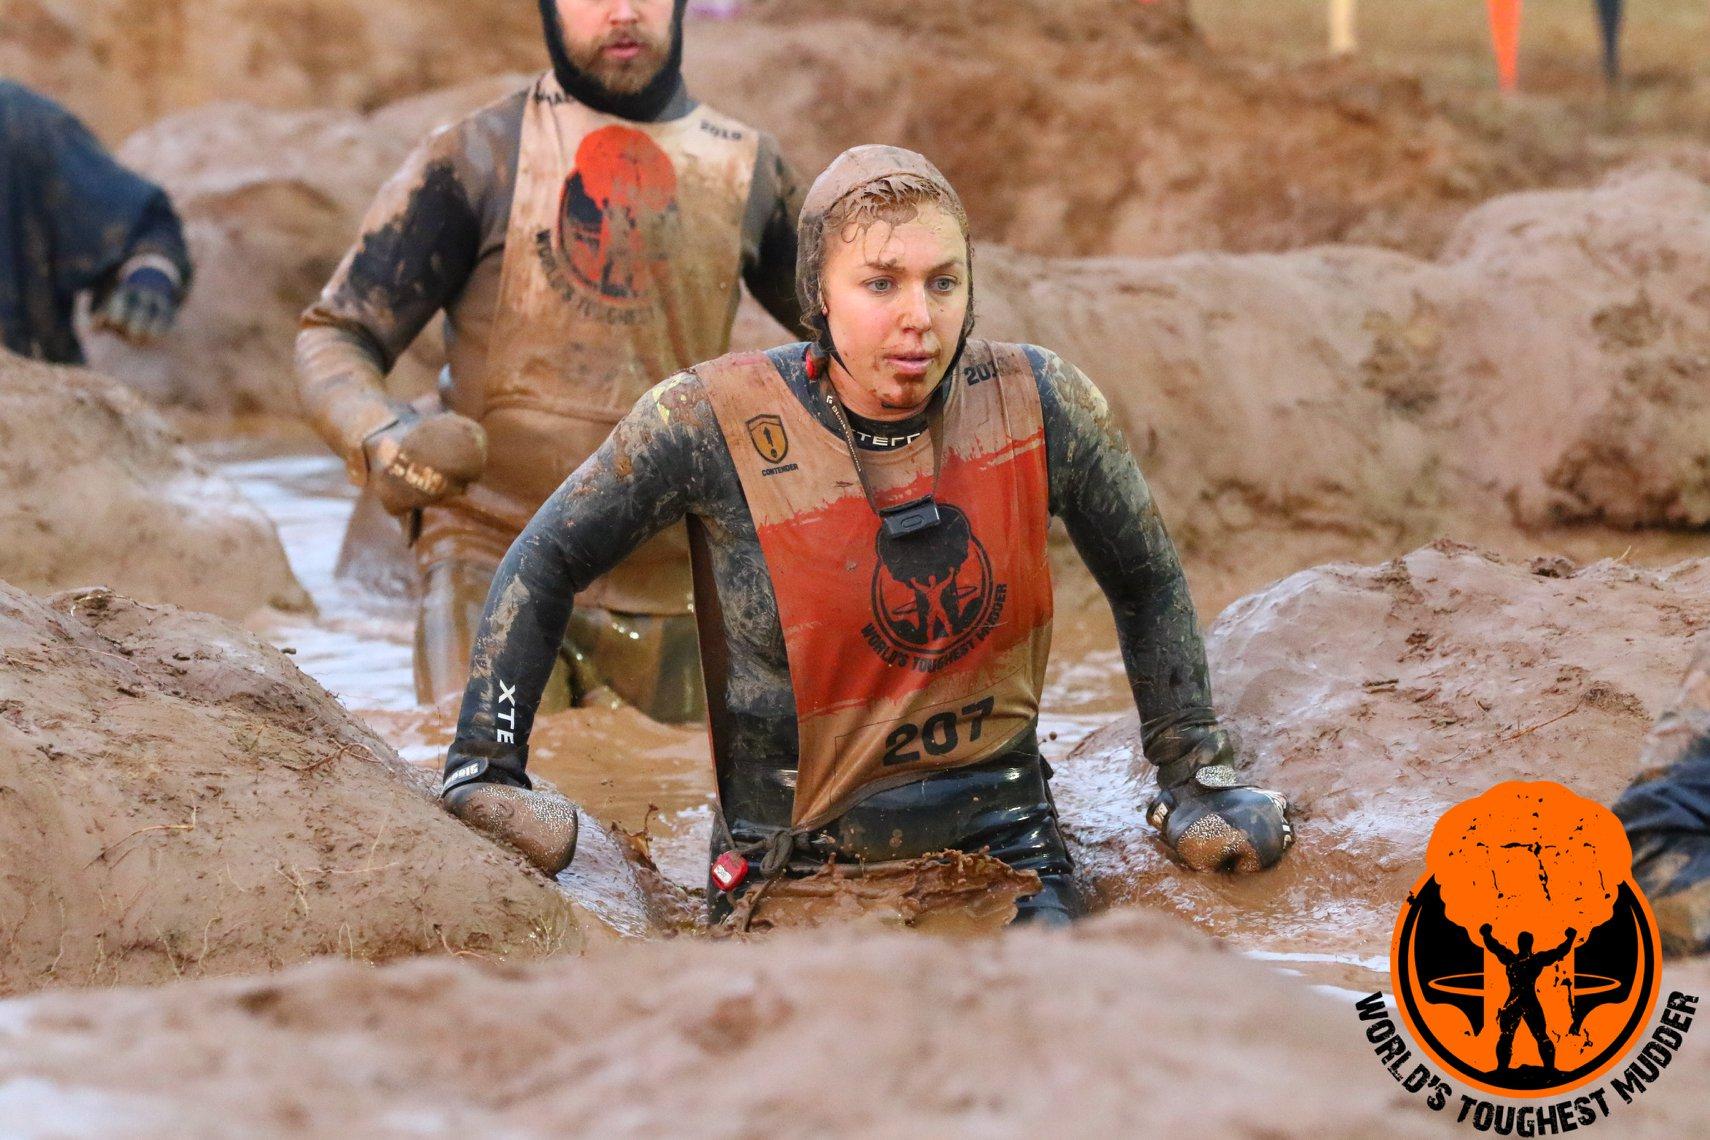 Erin Rost World's Toughest Mudder